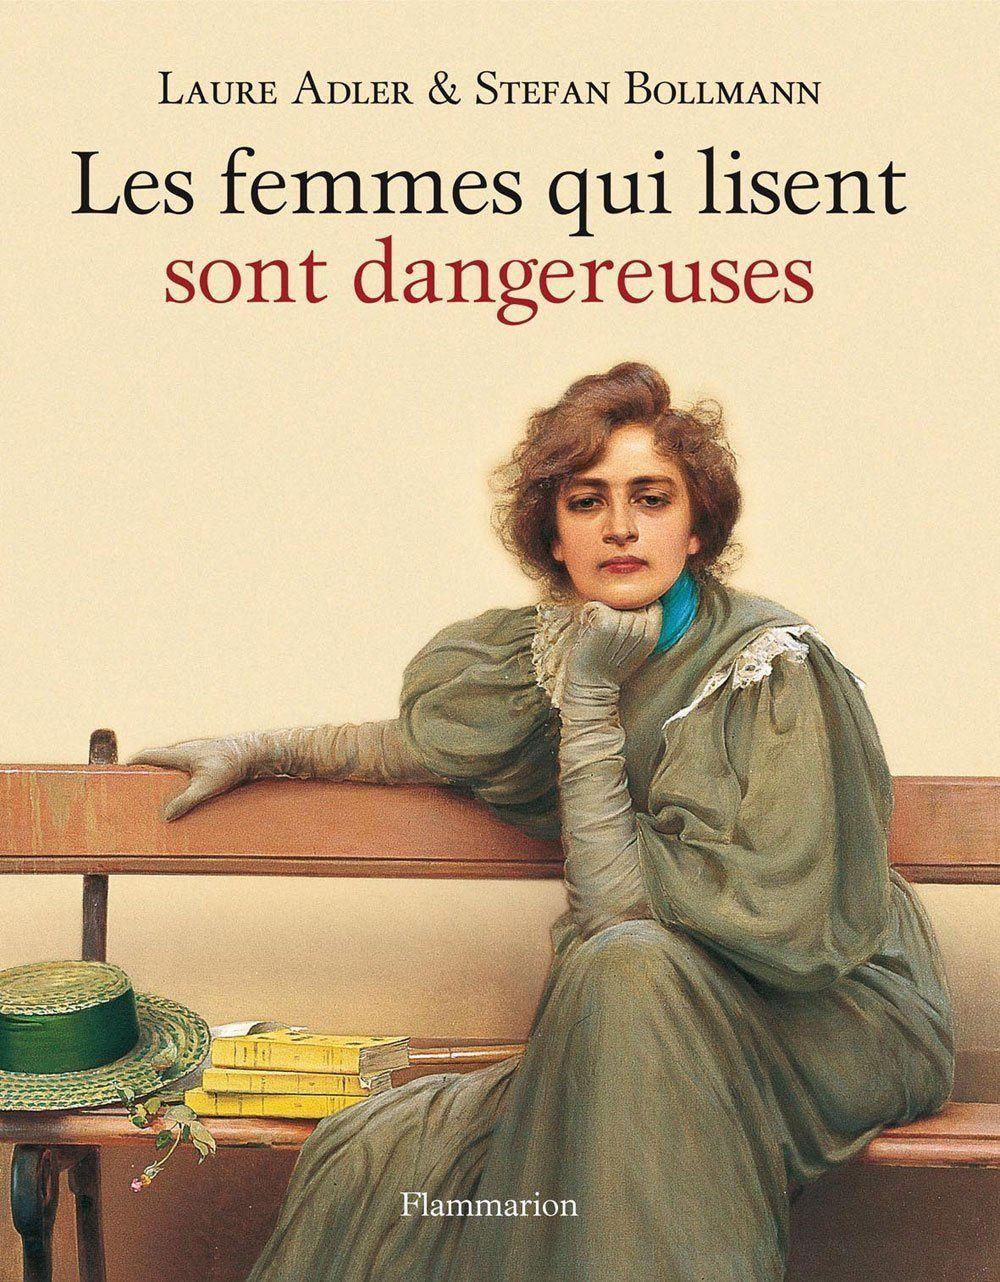 """Les femmes qui lisent sont dangereuses"" / LIVRES / LAURE ADLER ET STEFAN BOLLMANN"